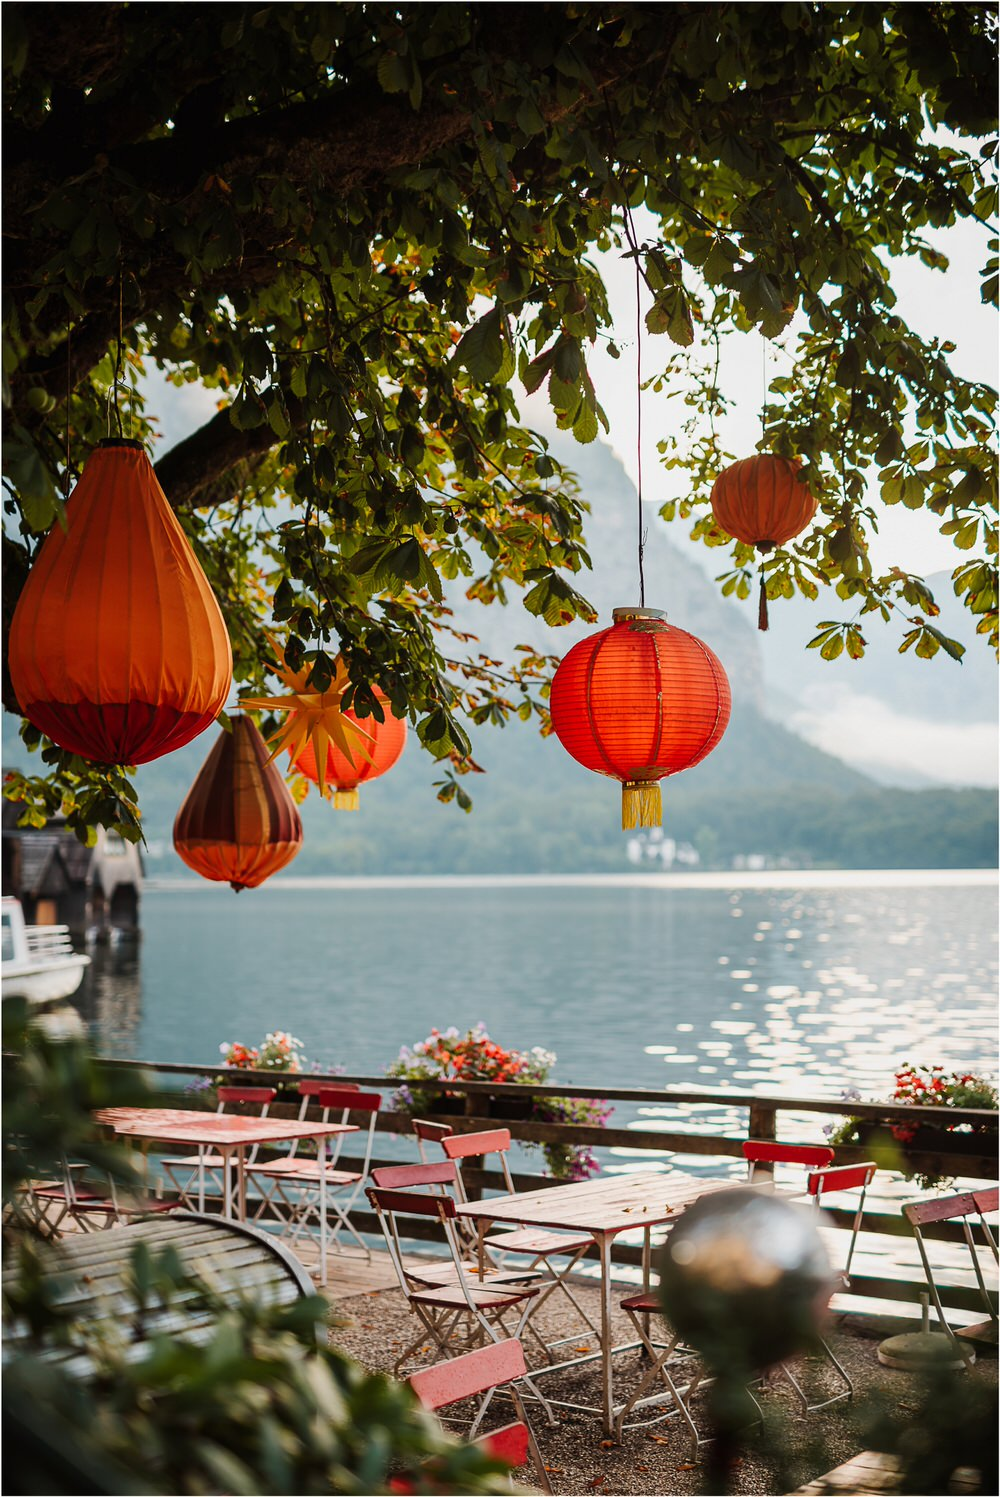 hallstatt austria wedding engagement photographer asian proposal surprise photography recommended nature professional 0008.jpg